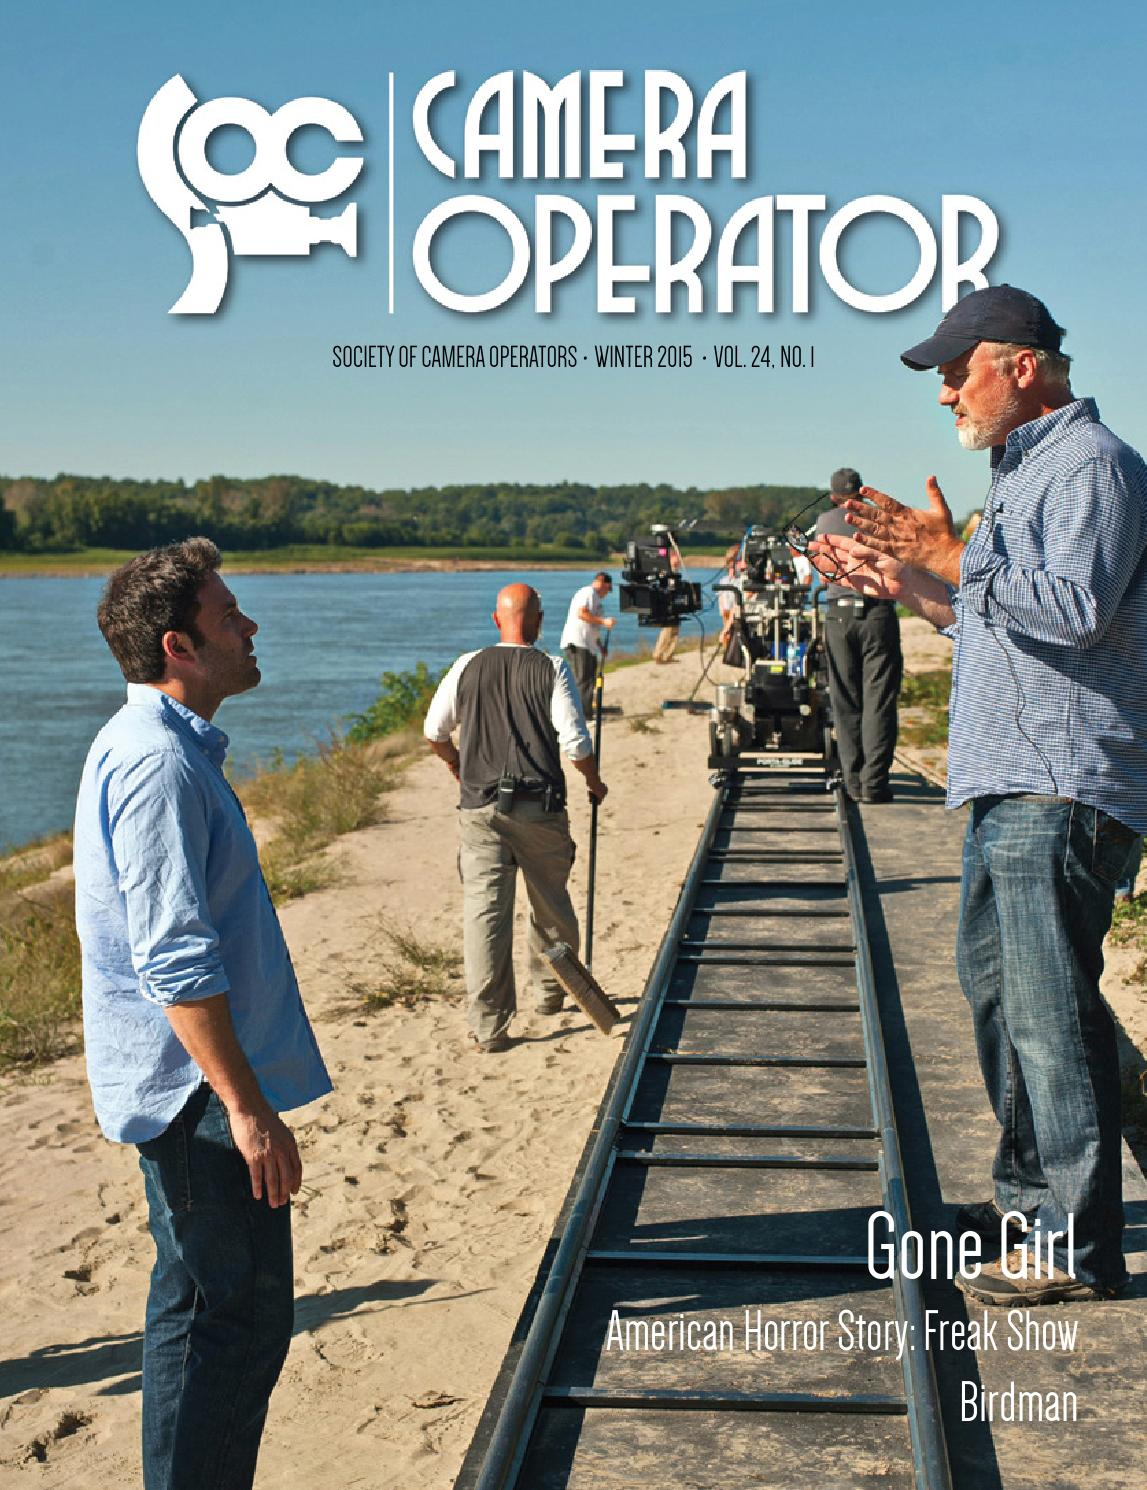 Camera Operator Winter 2015 by Society of Camera Operators - issuu